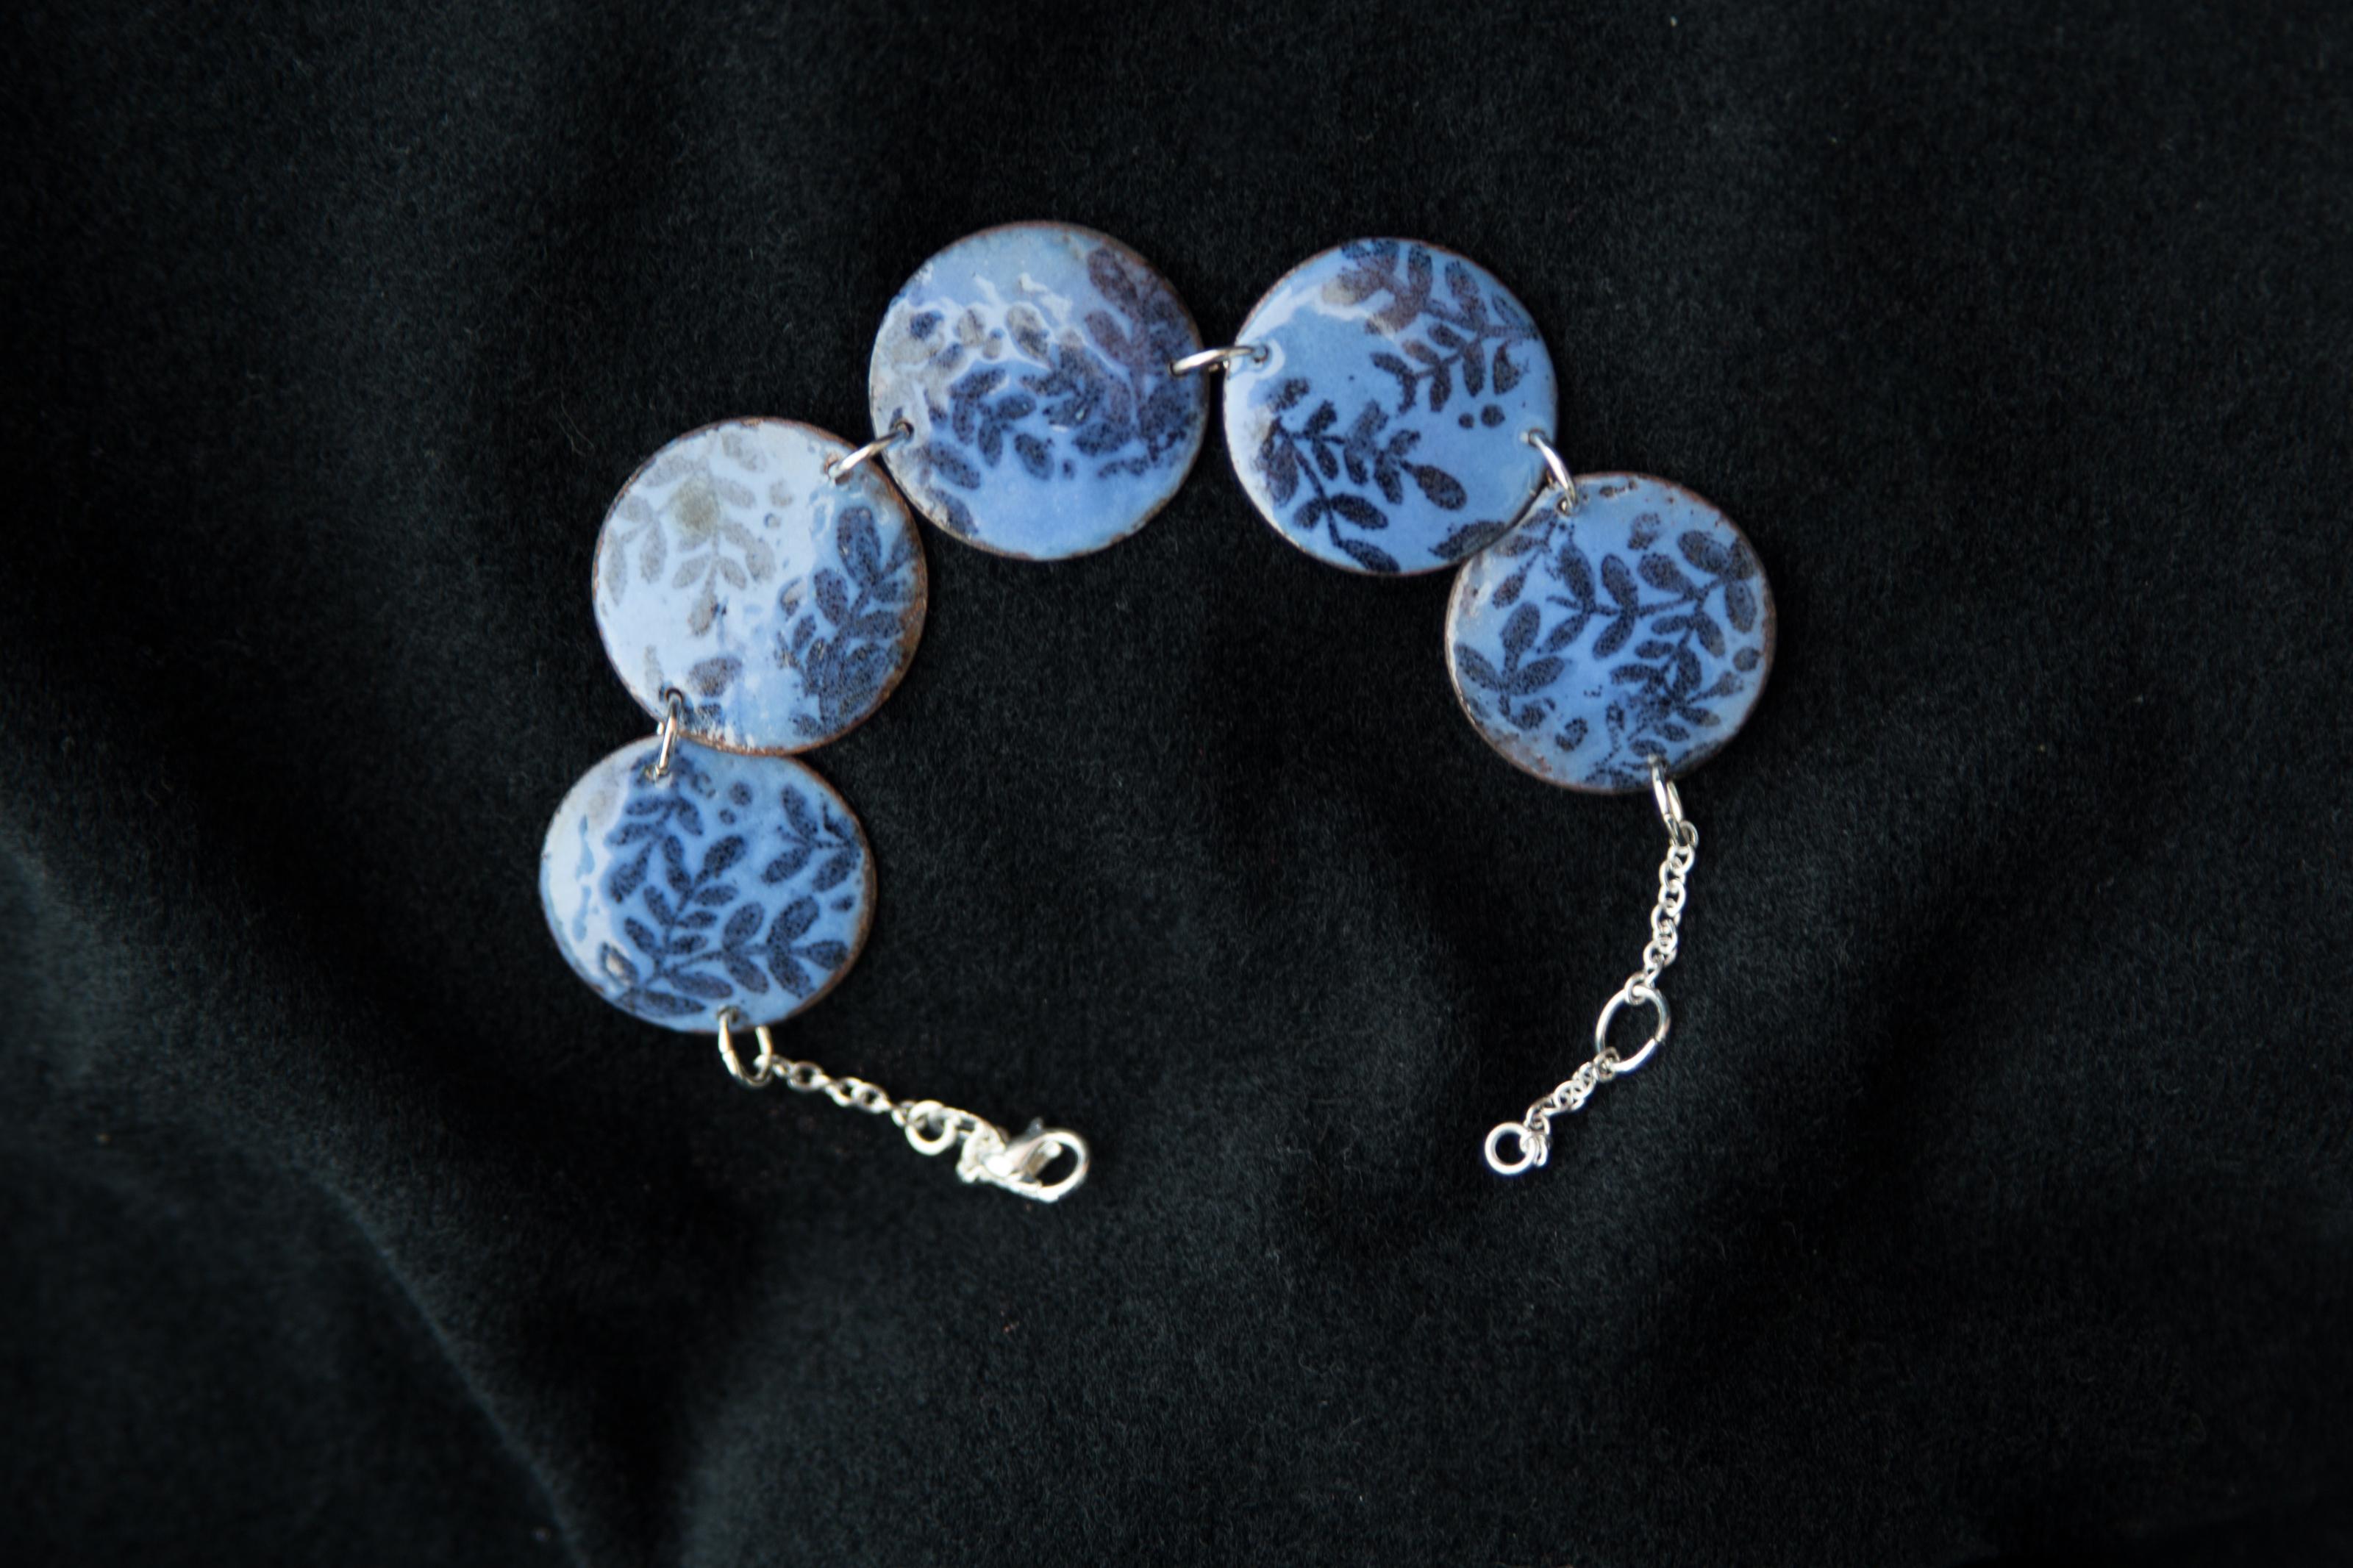 Hand crafted glass enamel bracelet